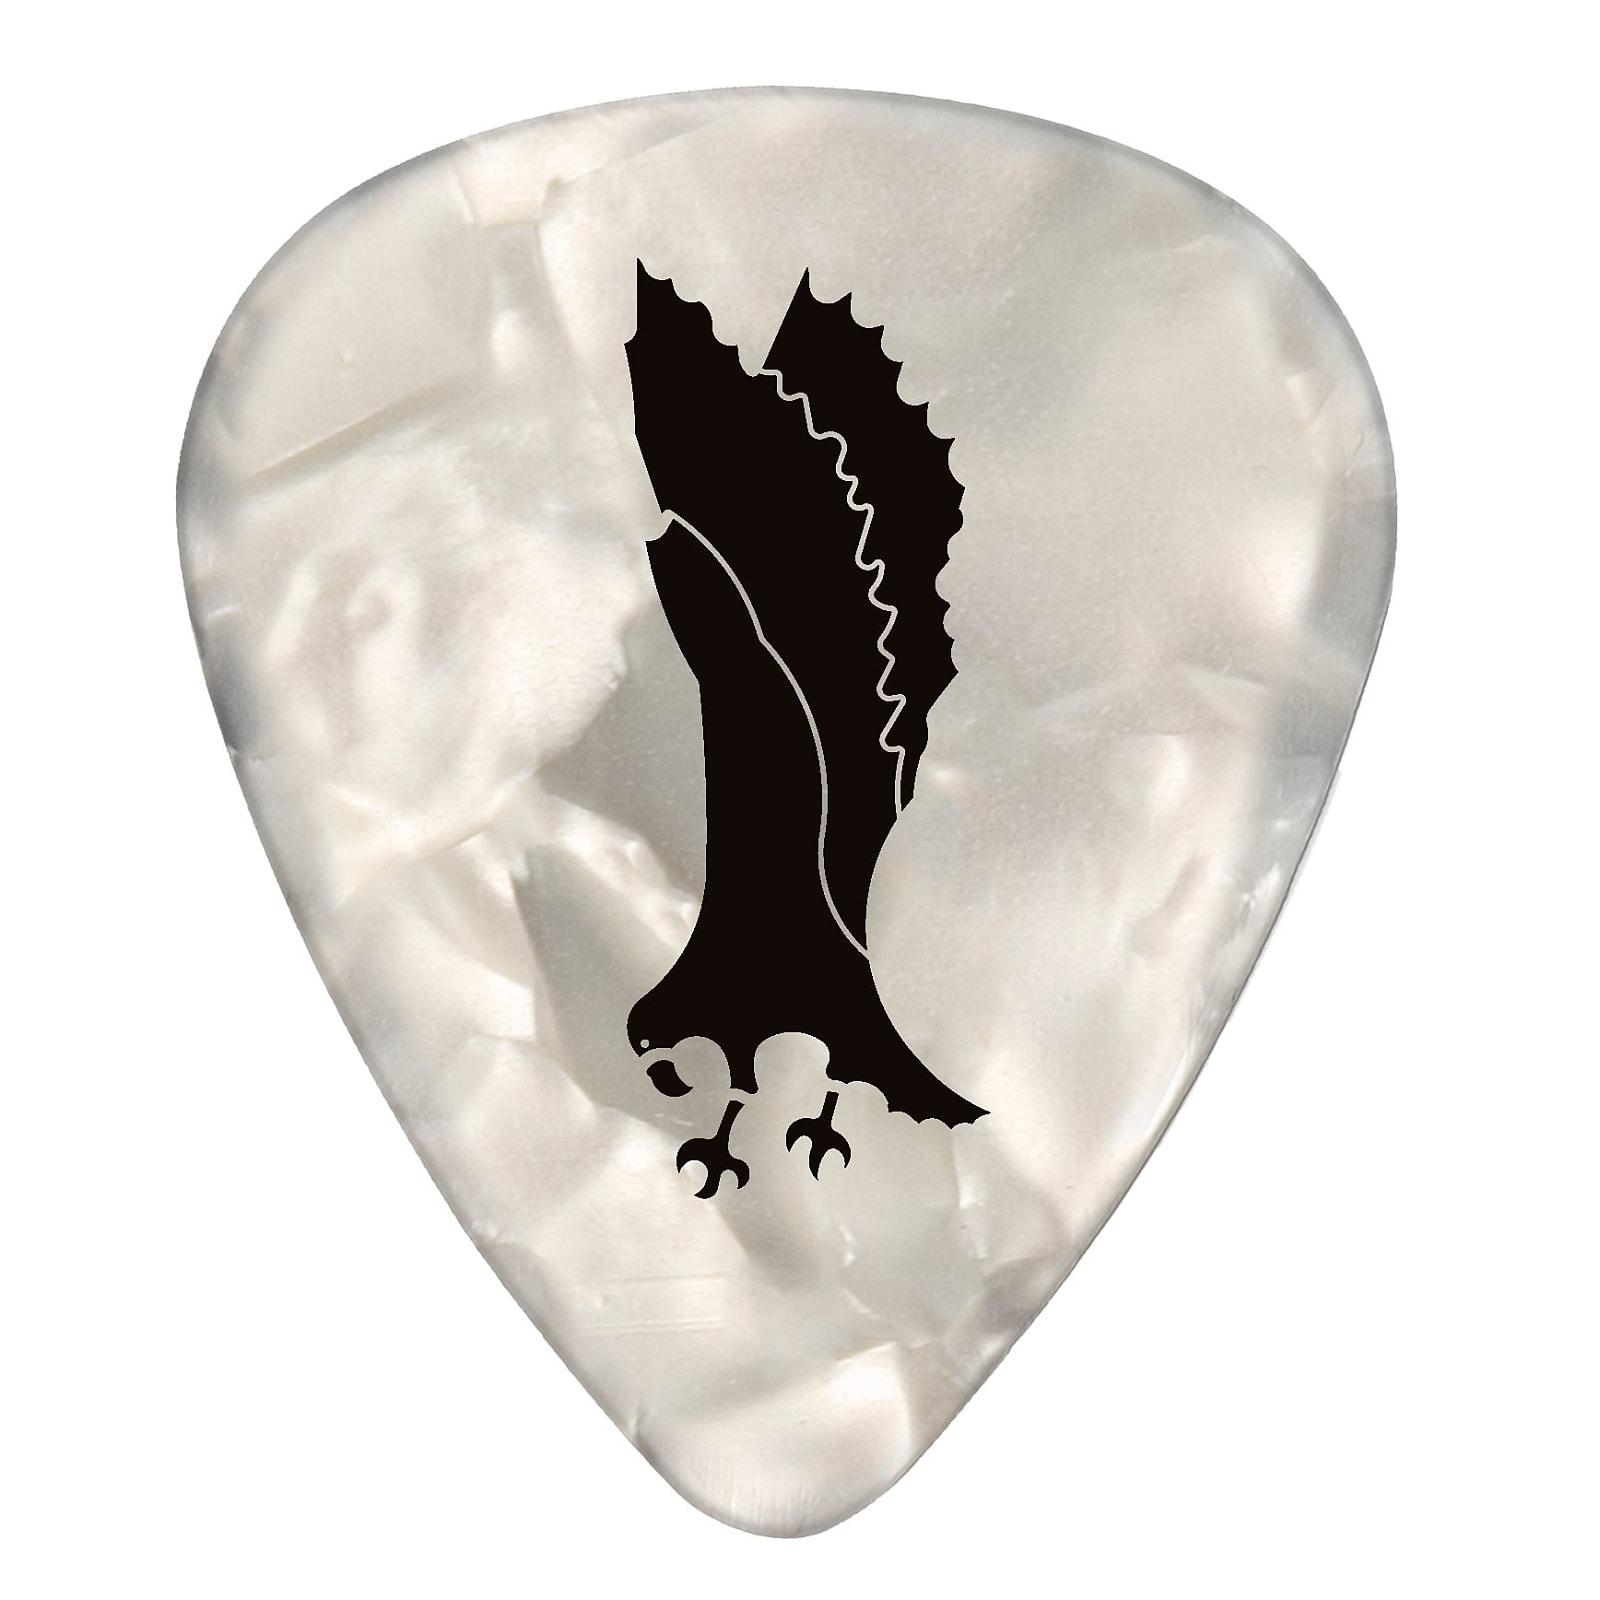 Paul Reed Smith PRS White Pearloid Celluloid Guitar Picks (12) – Thin